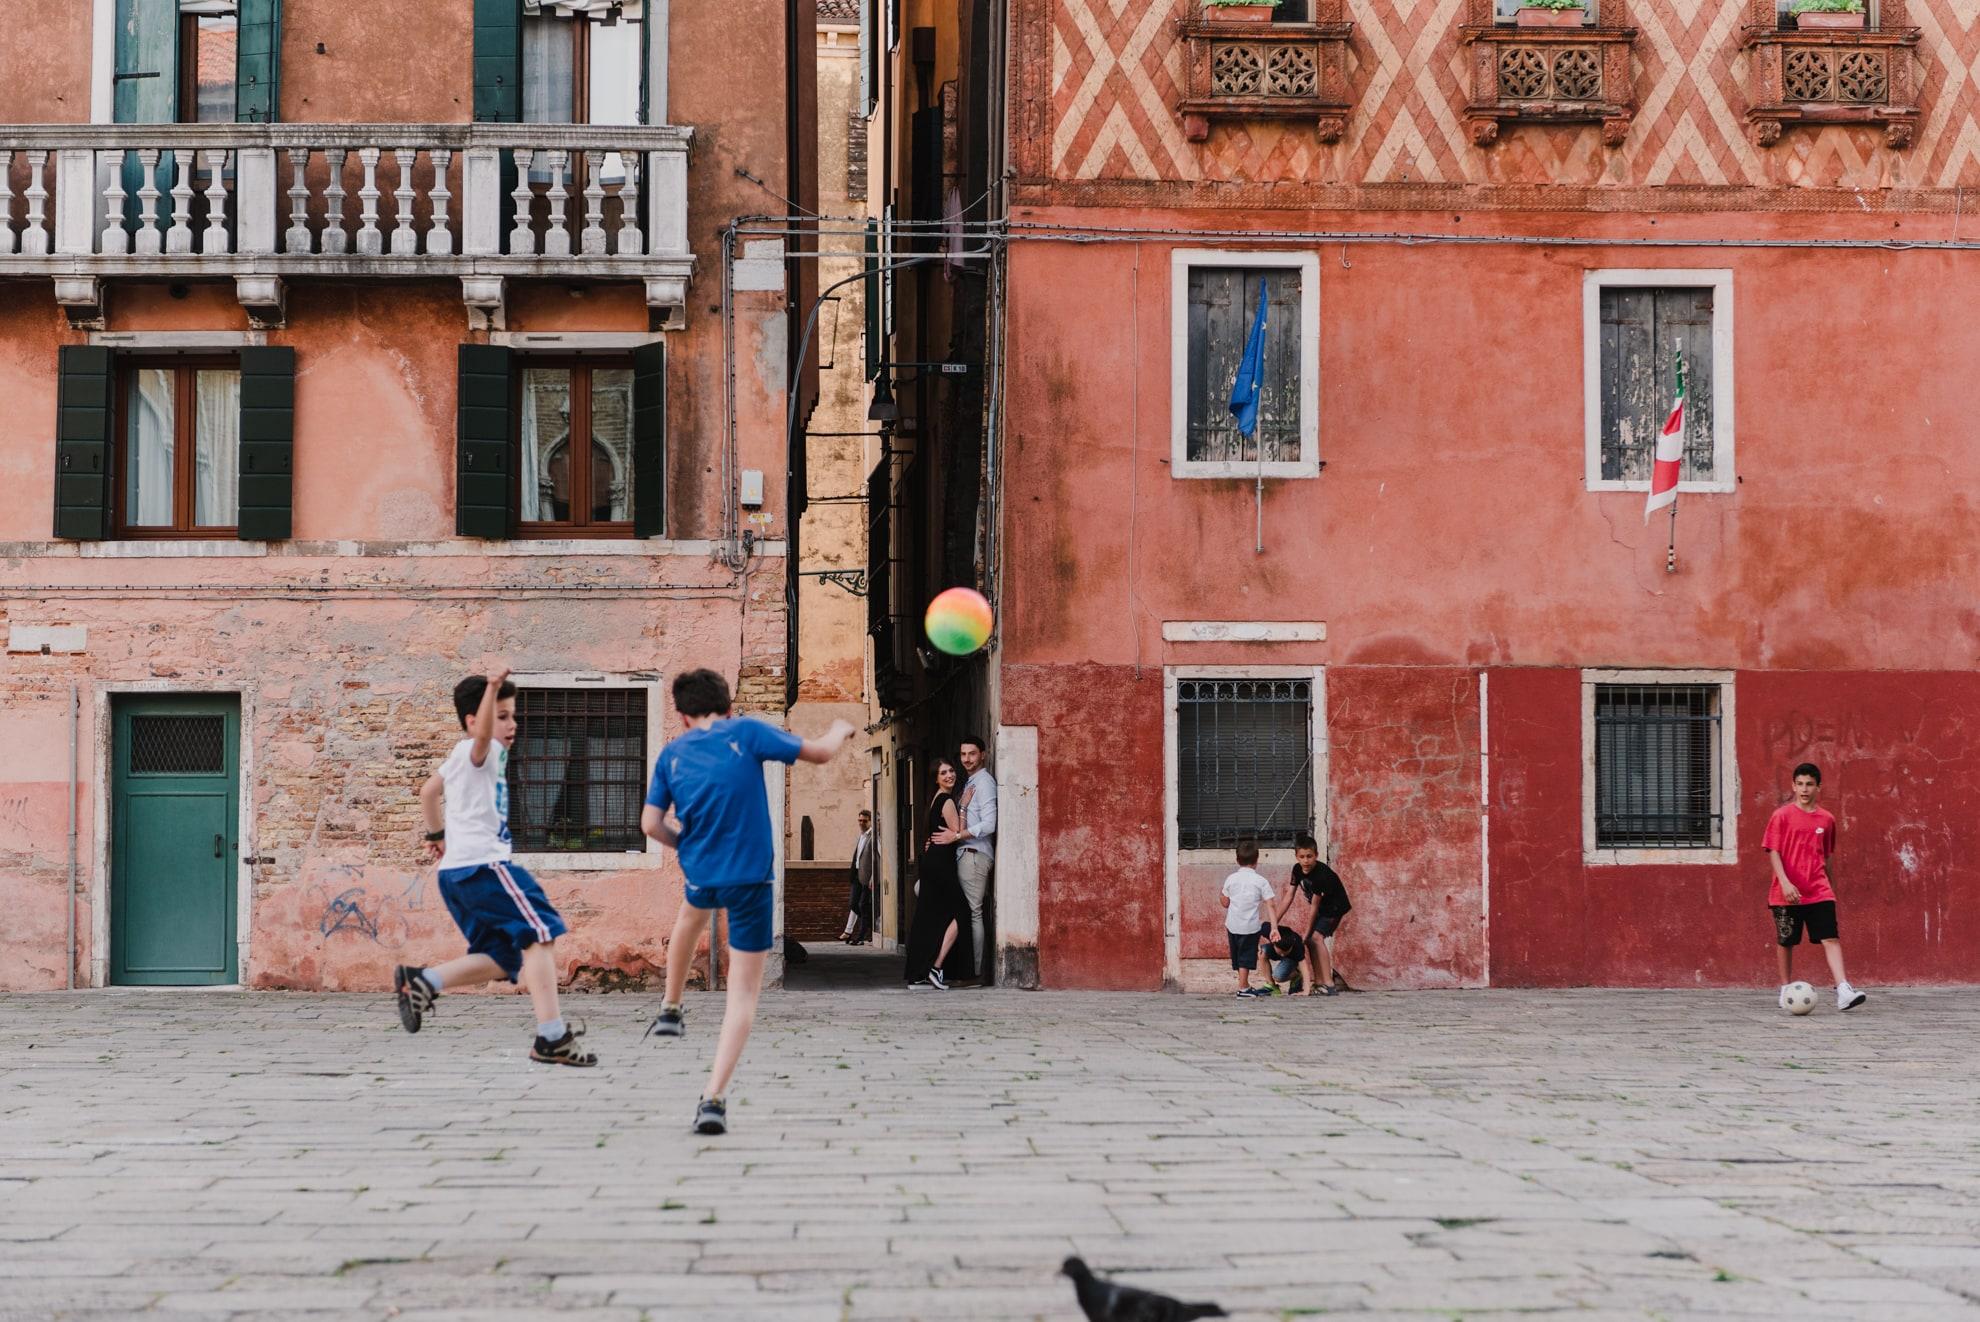 engagement venice venezia proposal proposta matrimonio fidanzamento irene pollacchi fotografa 9